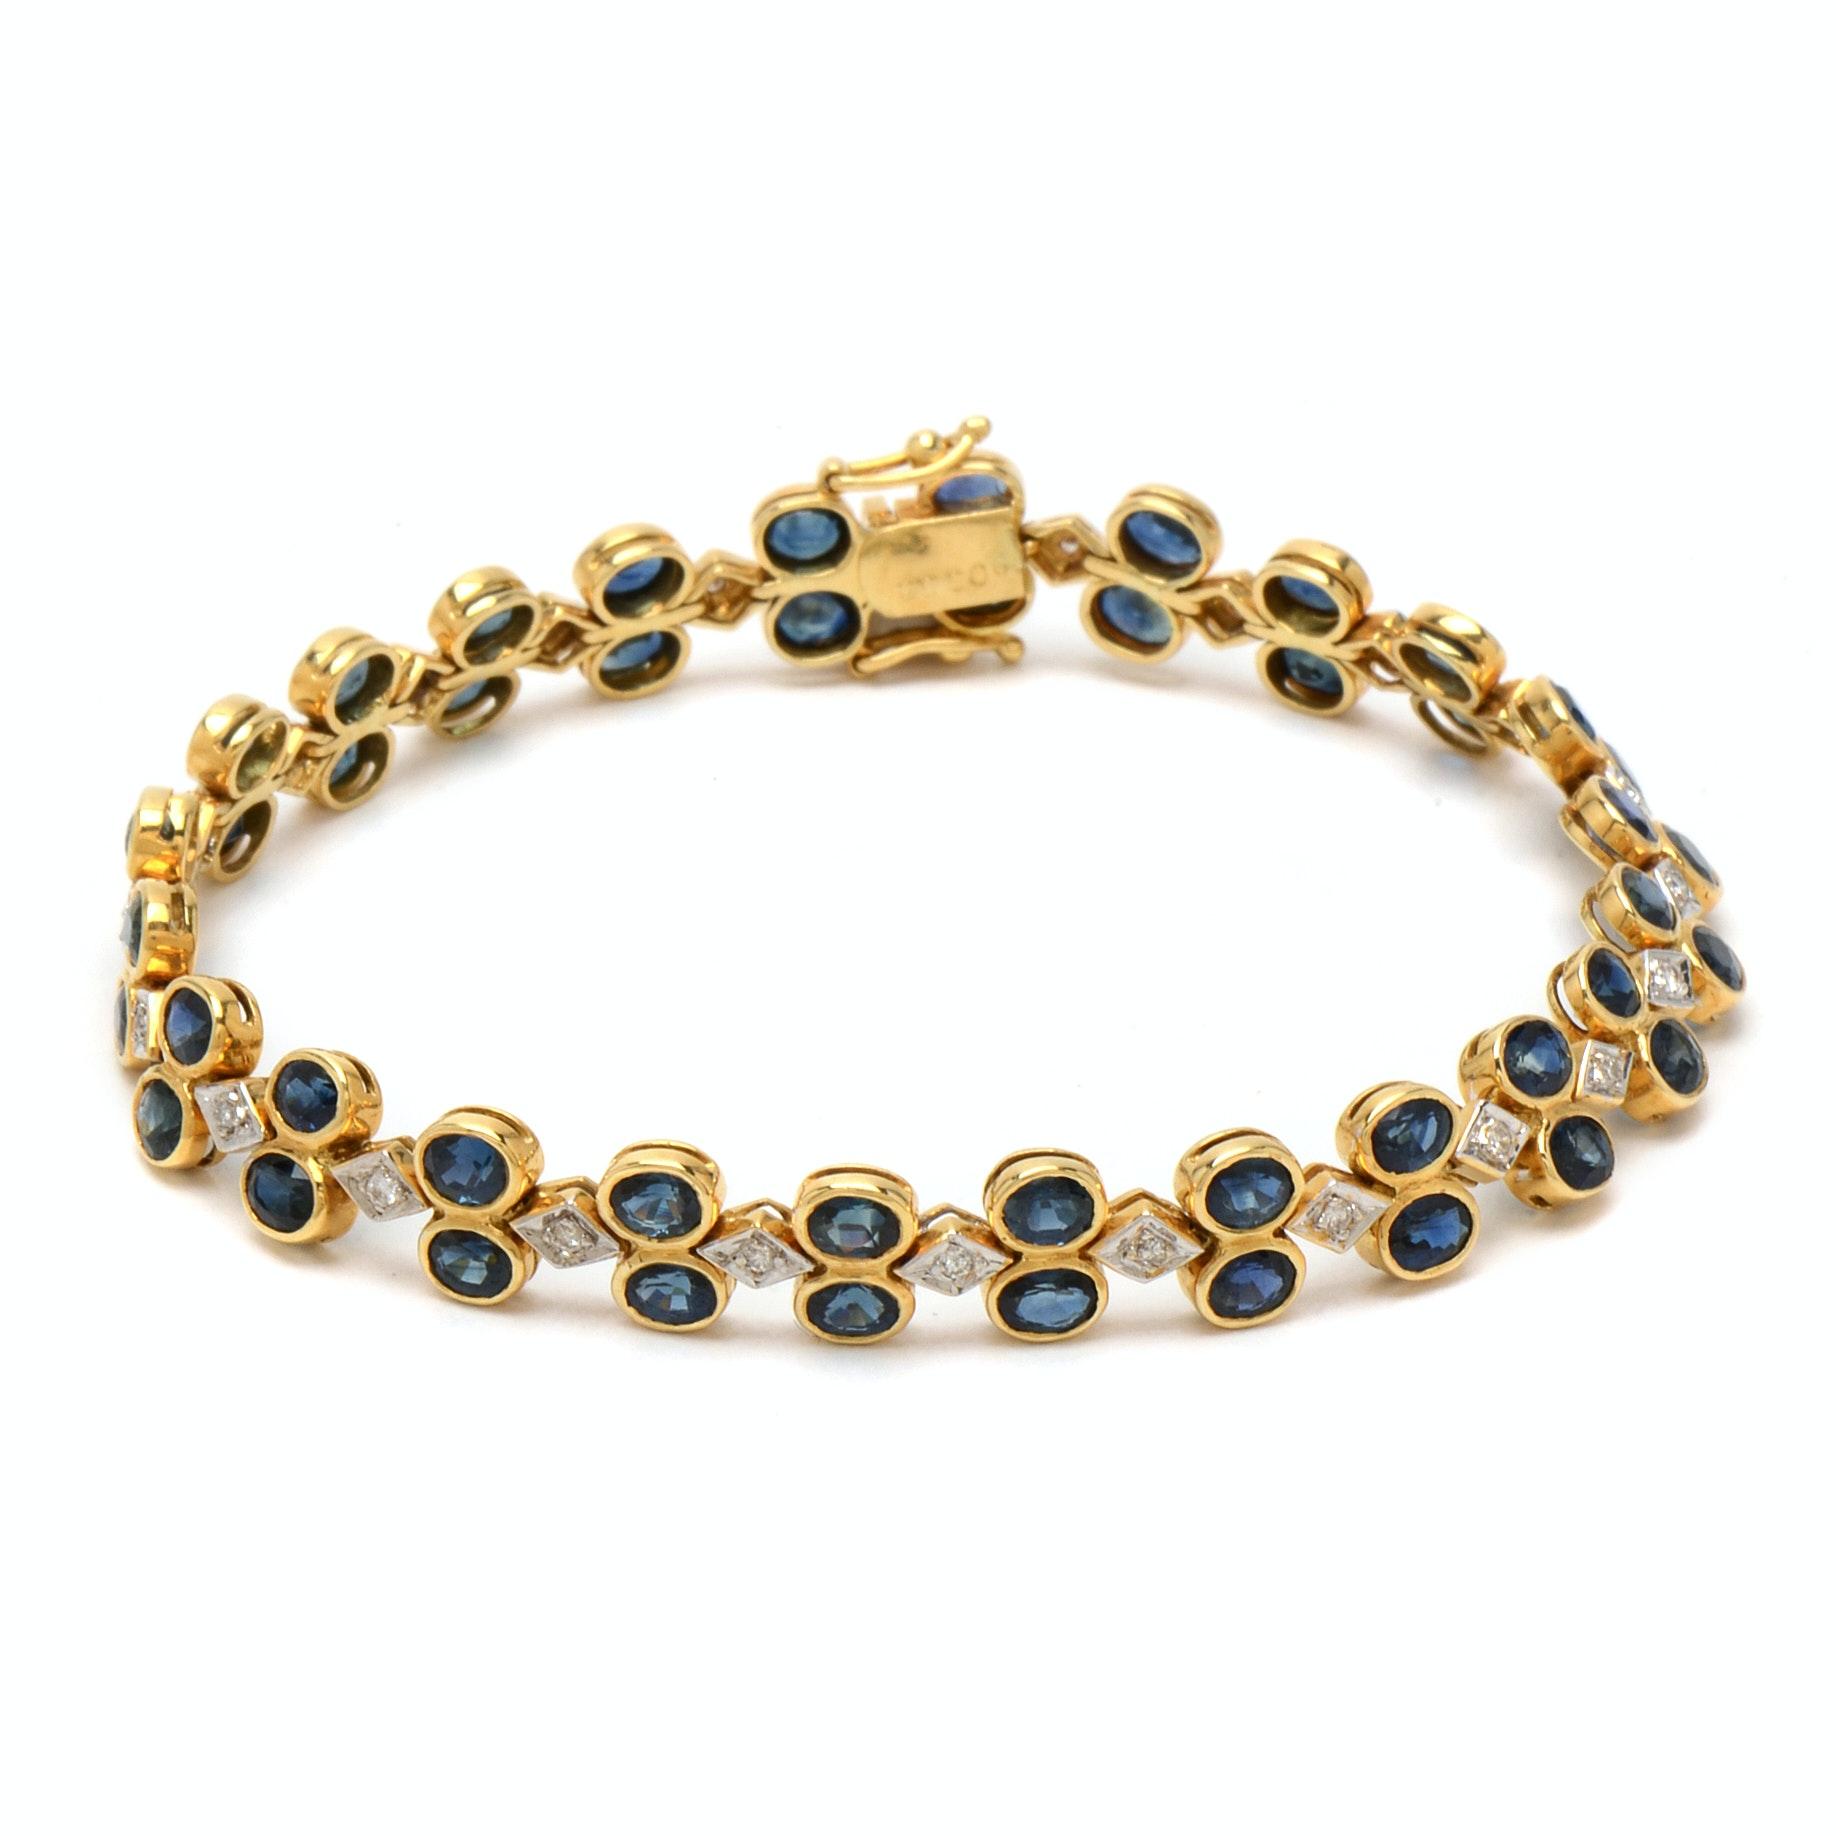 18K Yellow Gold Blue Sapphire and Diamond Linked Bracelet